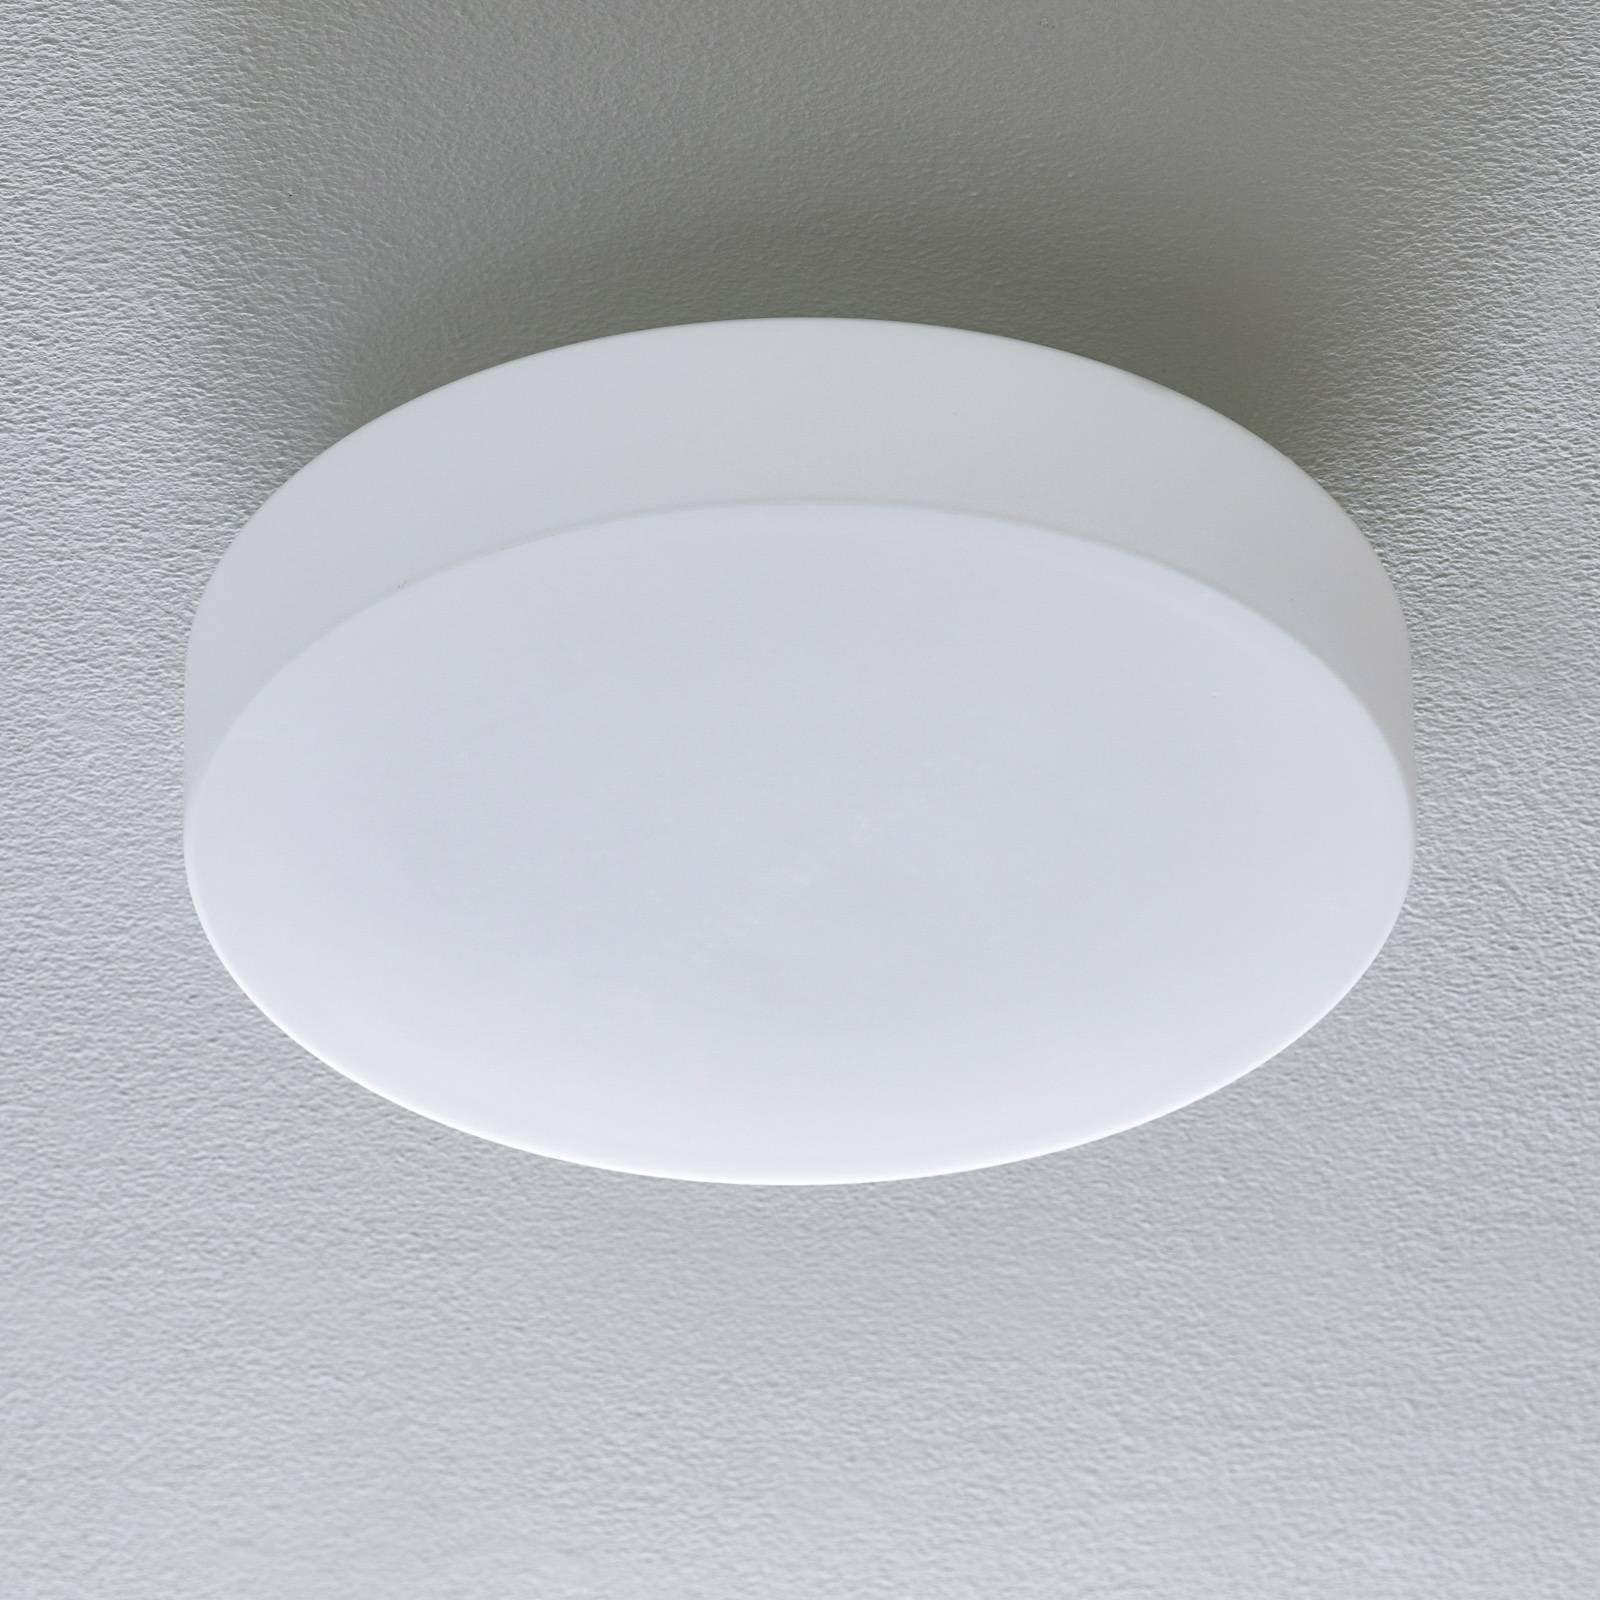 BEGA 50651 LED-taklampe opalglass 3 000 K Ø34cm